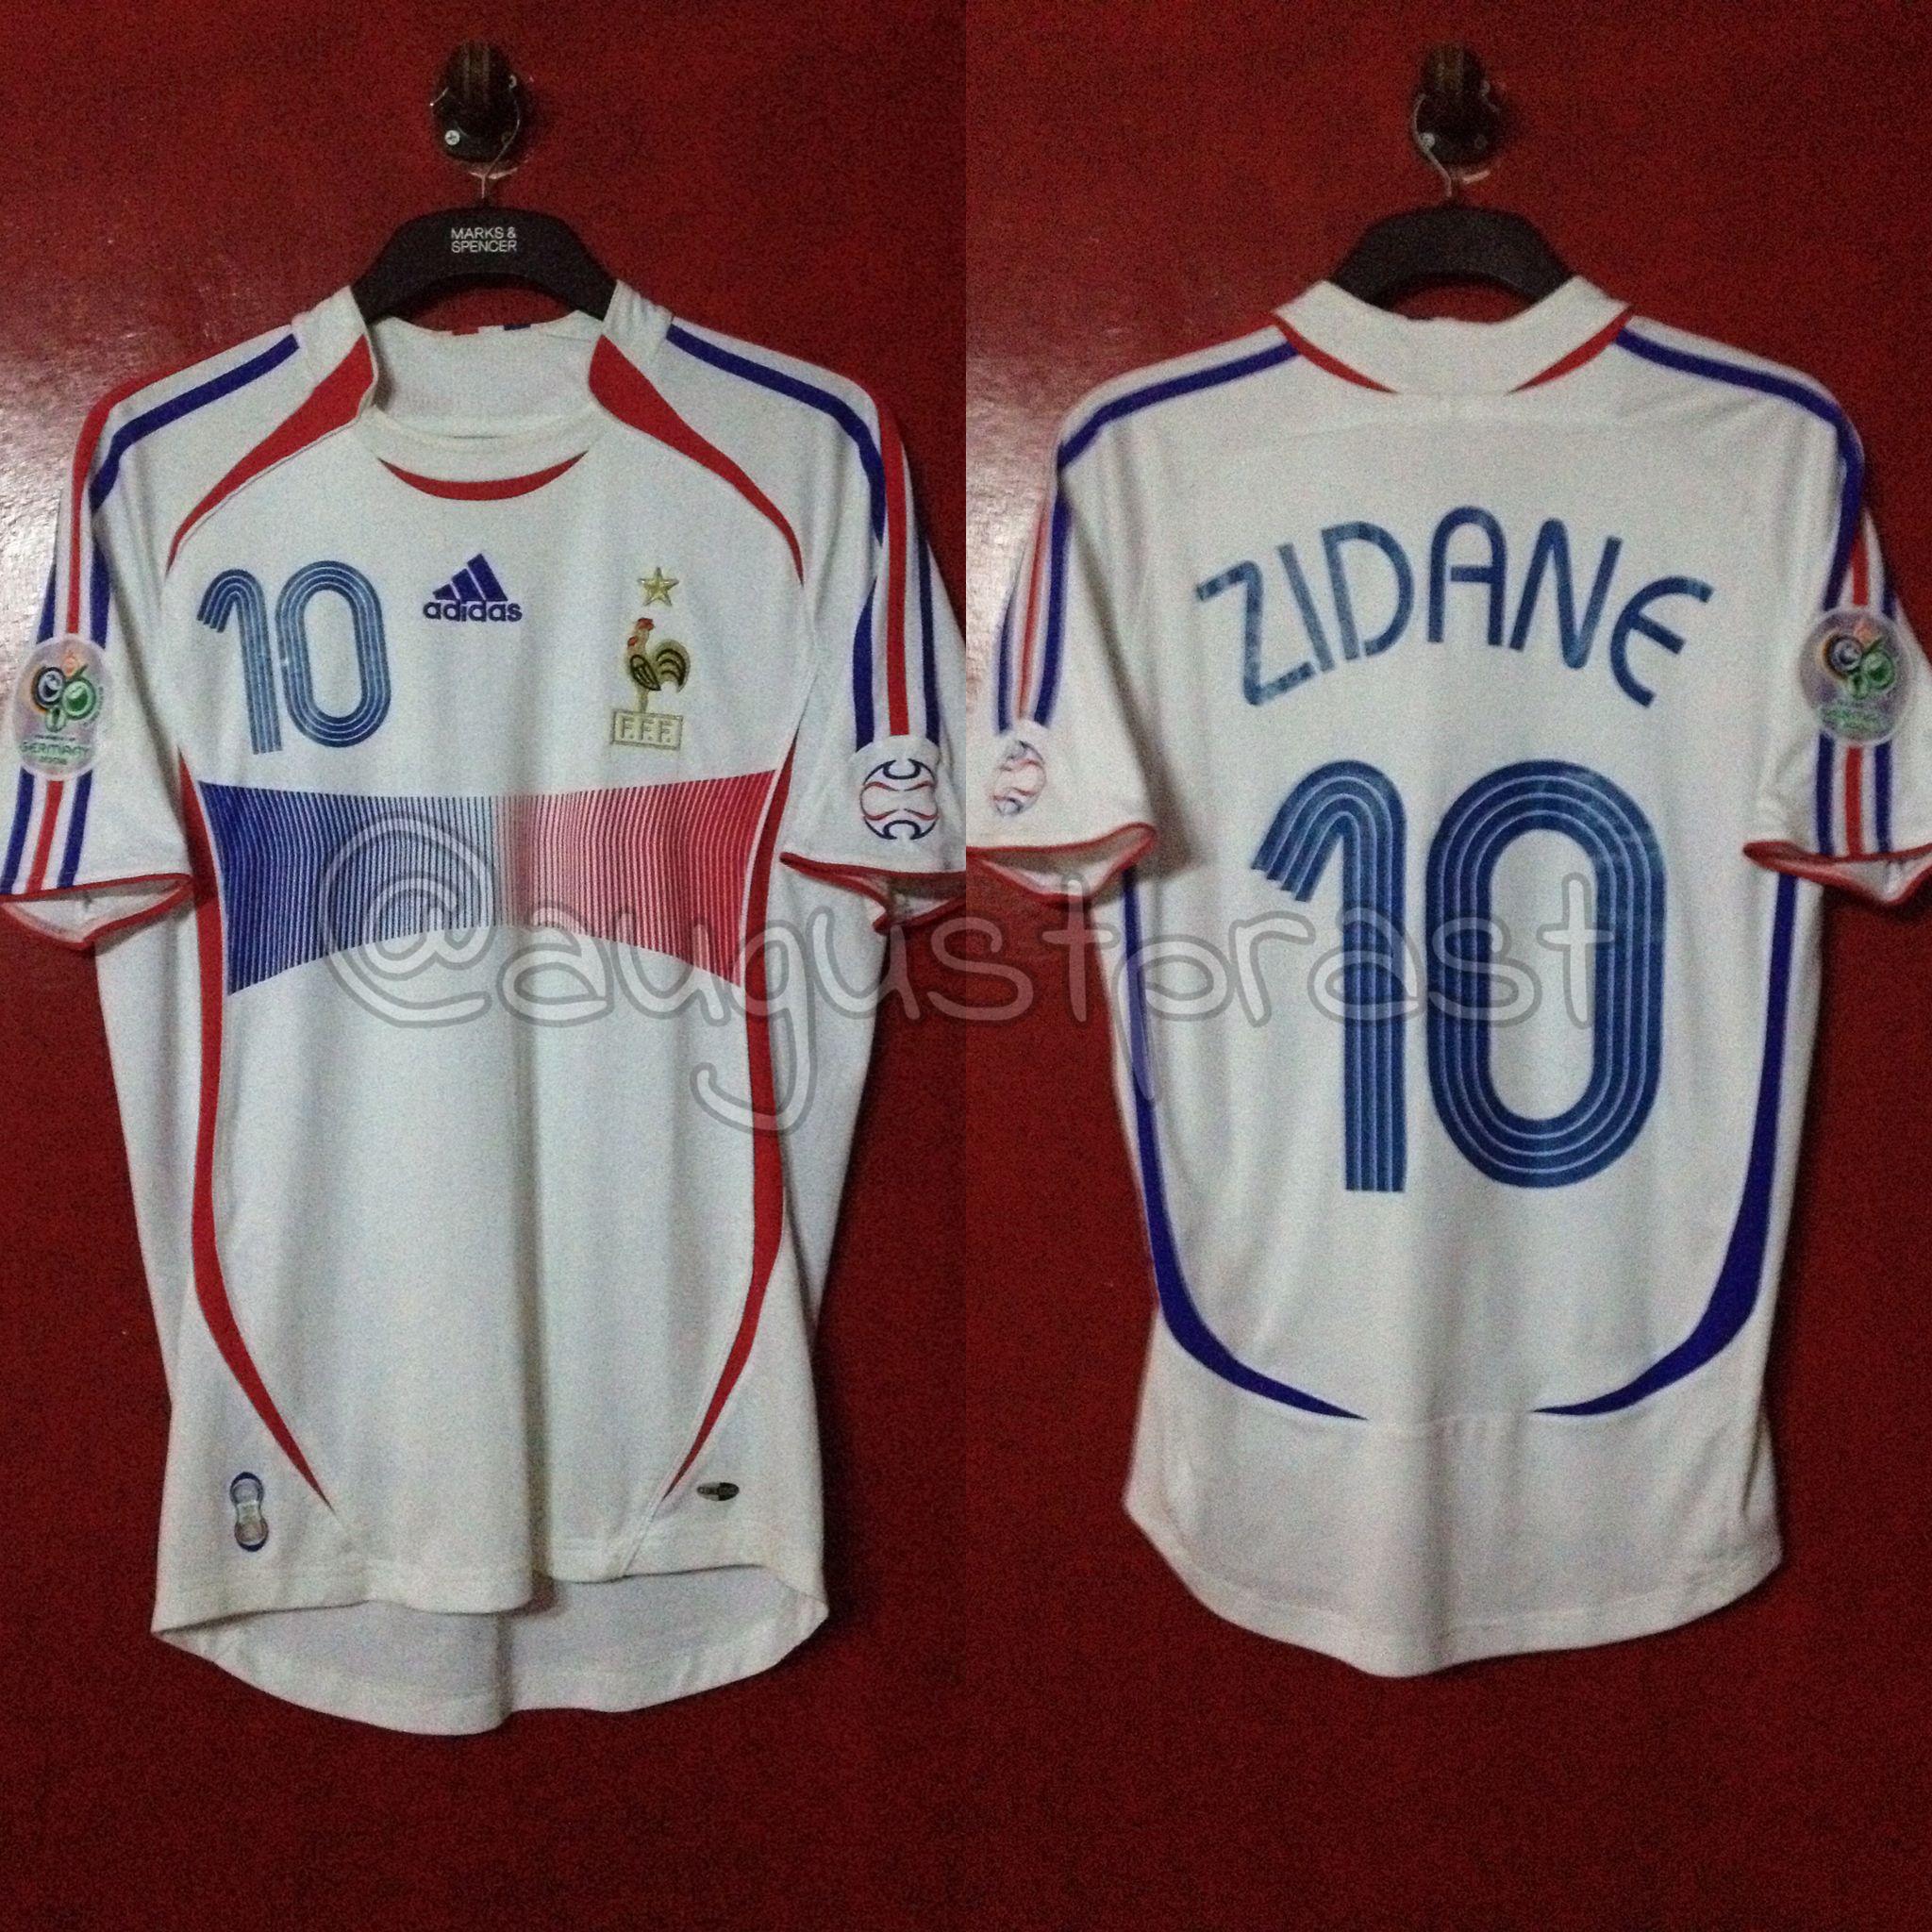 France 2006 2008 Away 10 Zidane France Jersey Sports Jersey Jersey